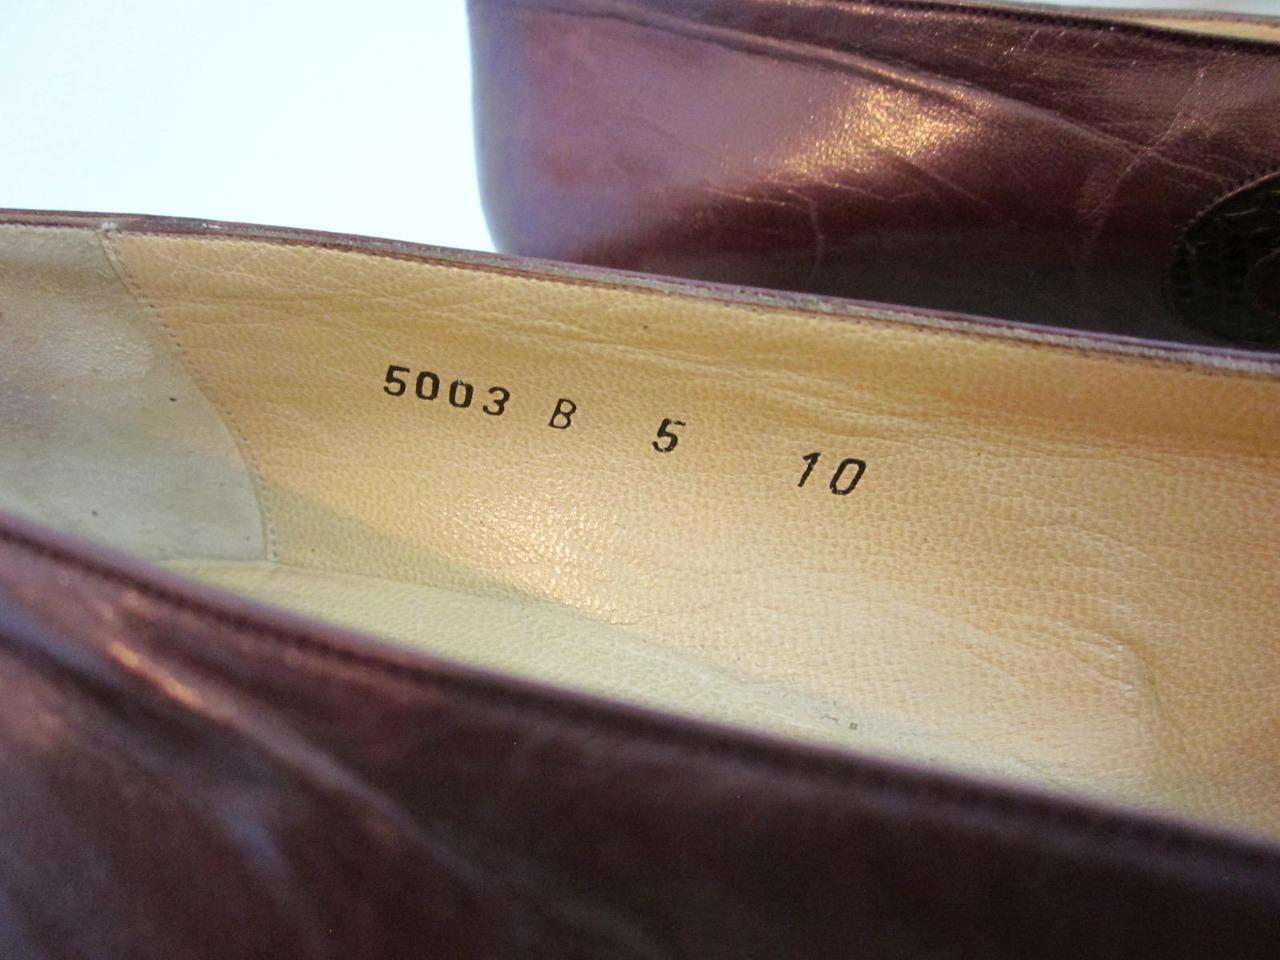 Bottega Veneta Heels Heels Heels Sz 10 Brown Sculptured Leather & Lizard Dustbag Rt  1150 10b8e7